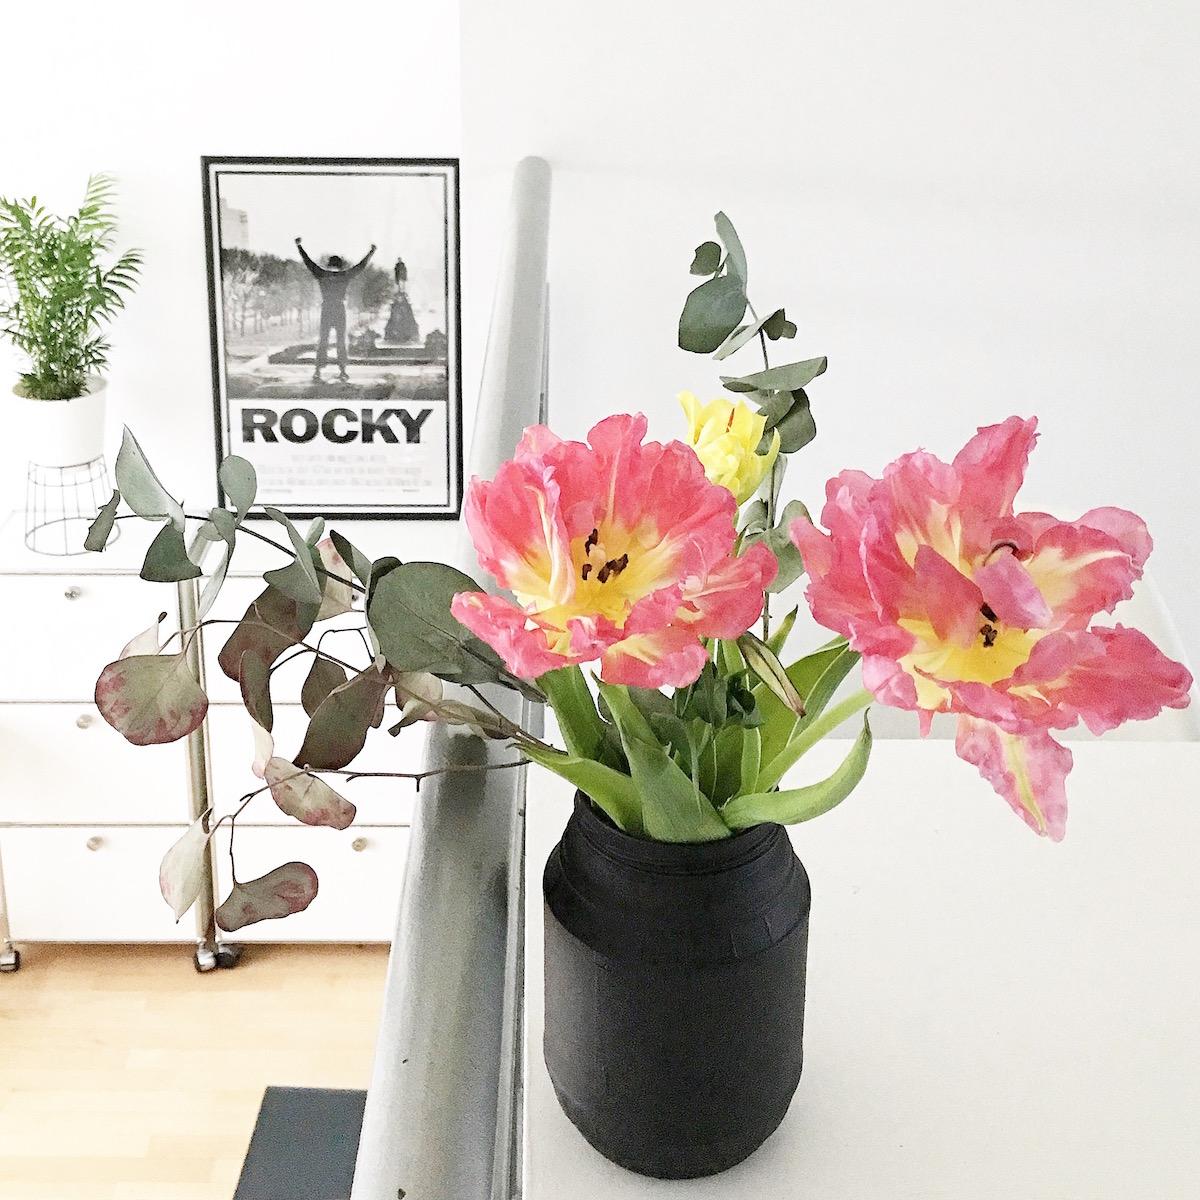 blumen deko sophiagaleria sophiagaleria. Black Bedroom Furniture Sets. Home Design Ideas